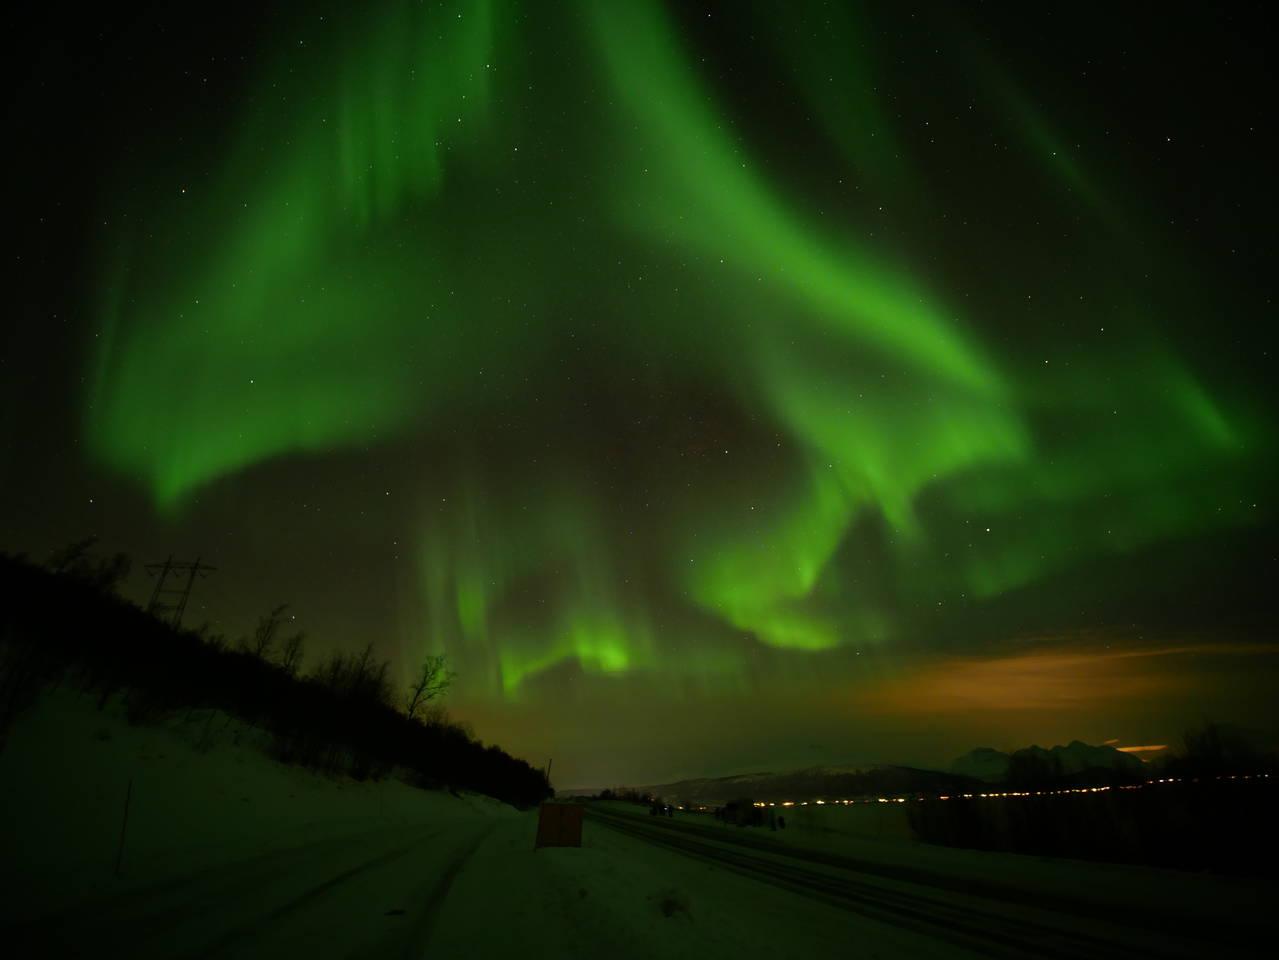 Aurora is dancing in the sky